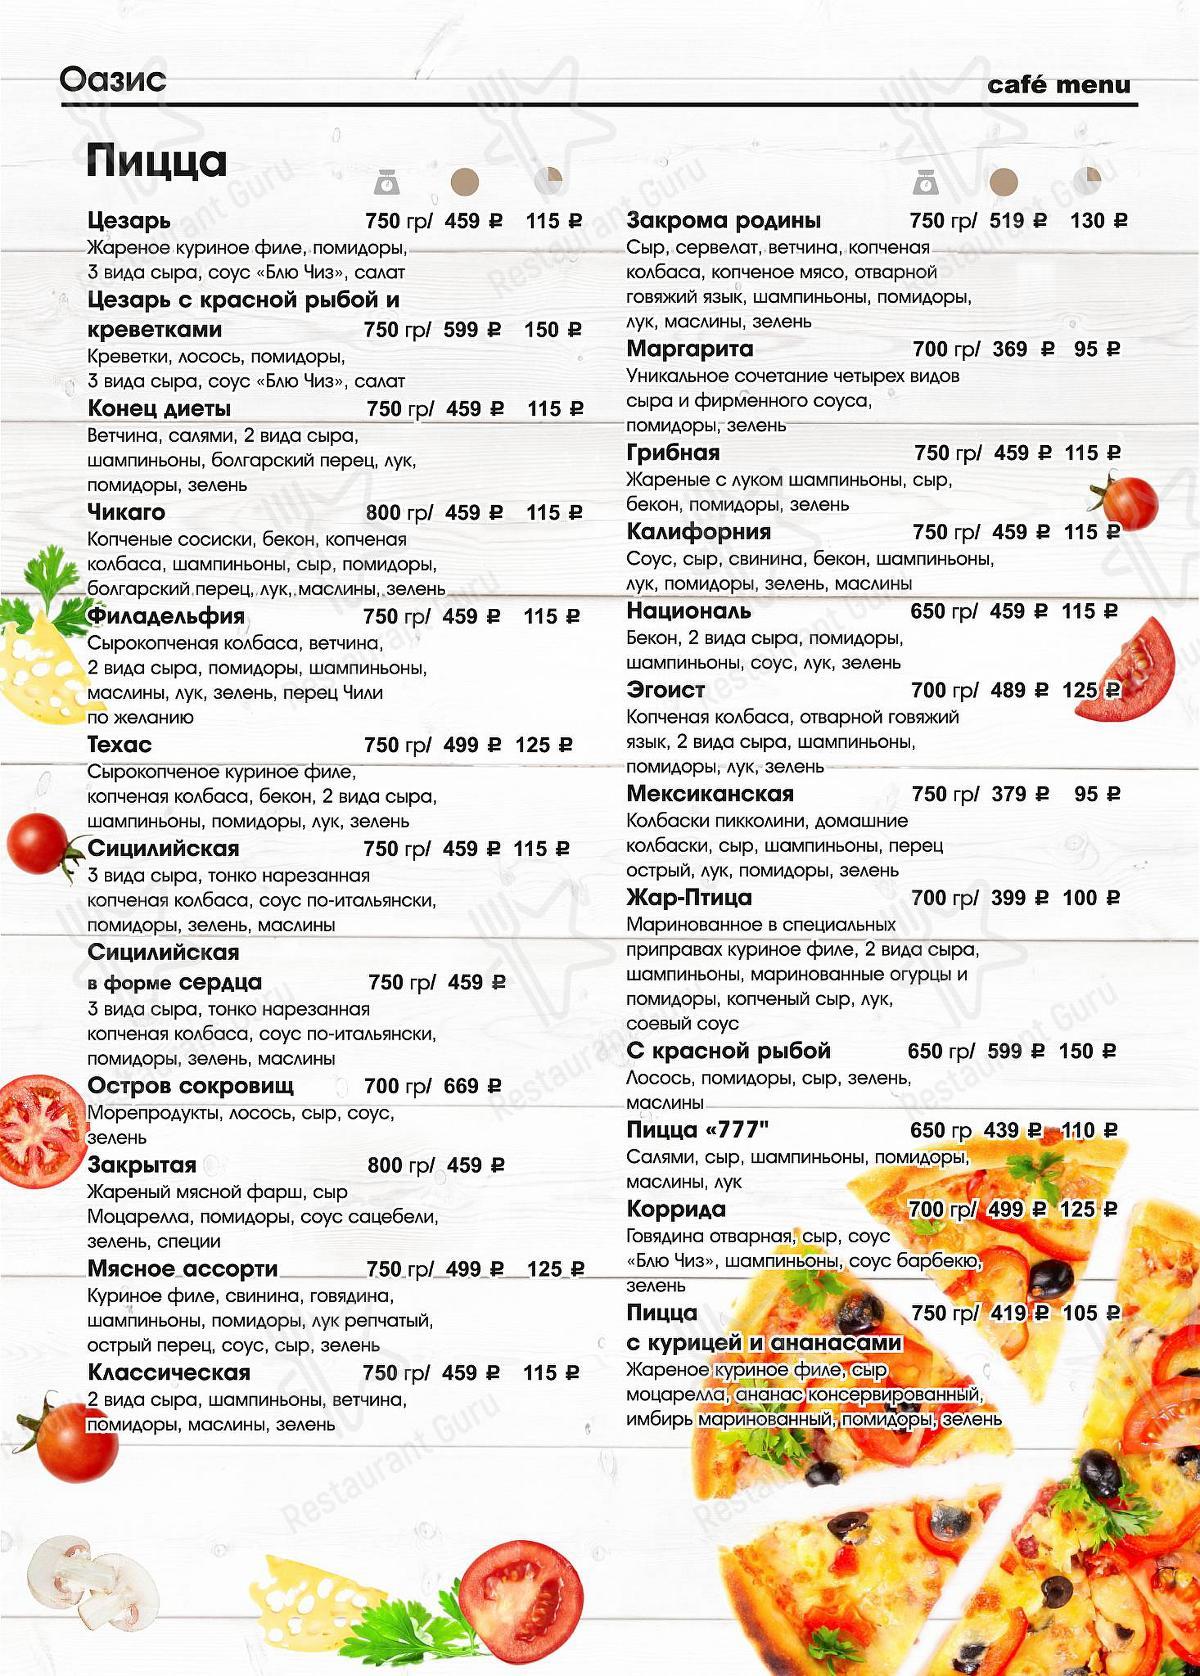 Оазис menu